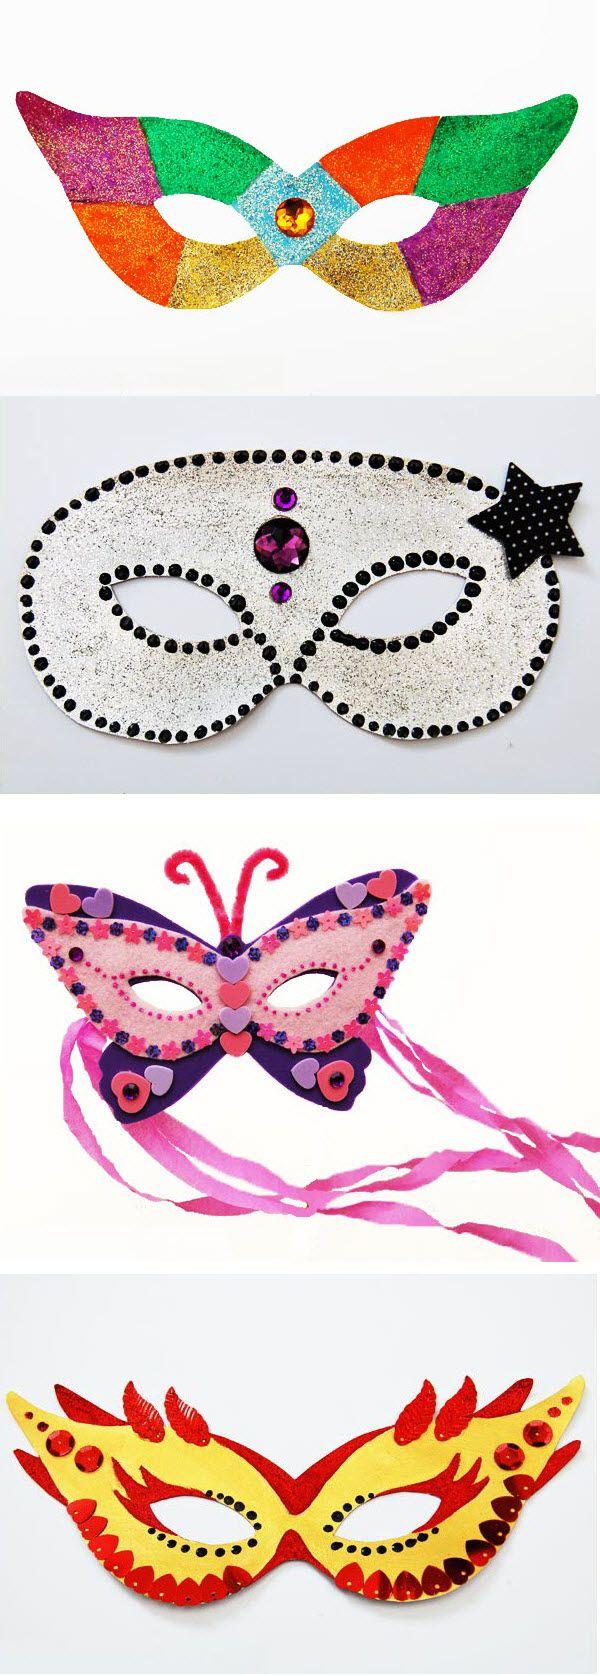 Masques carnaval faire soi meme patron a imprimer free - Masque de carnaval a imprimer ...